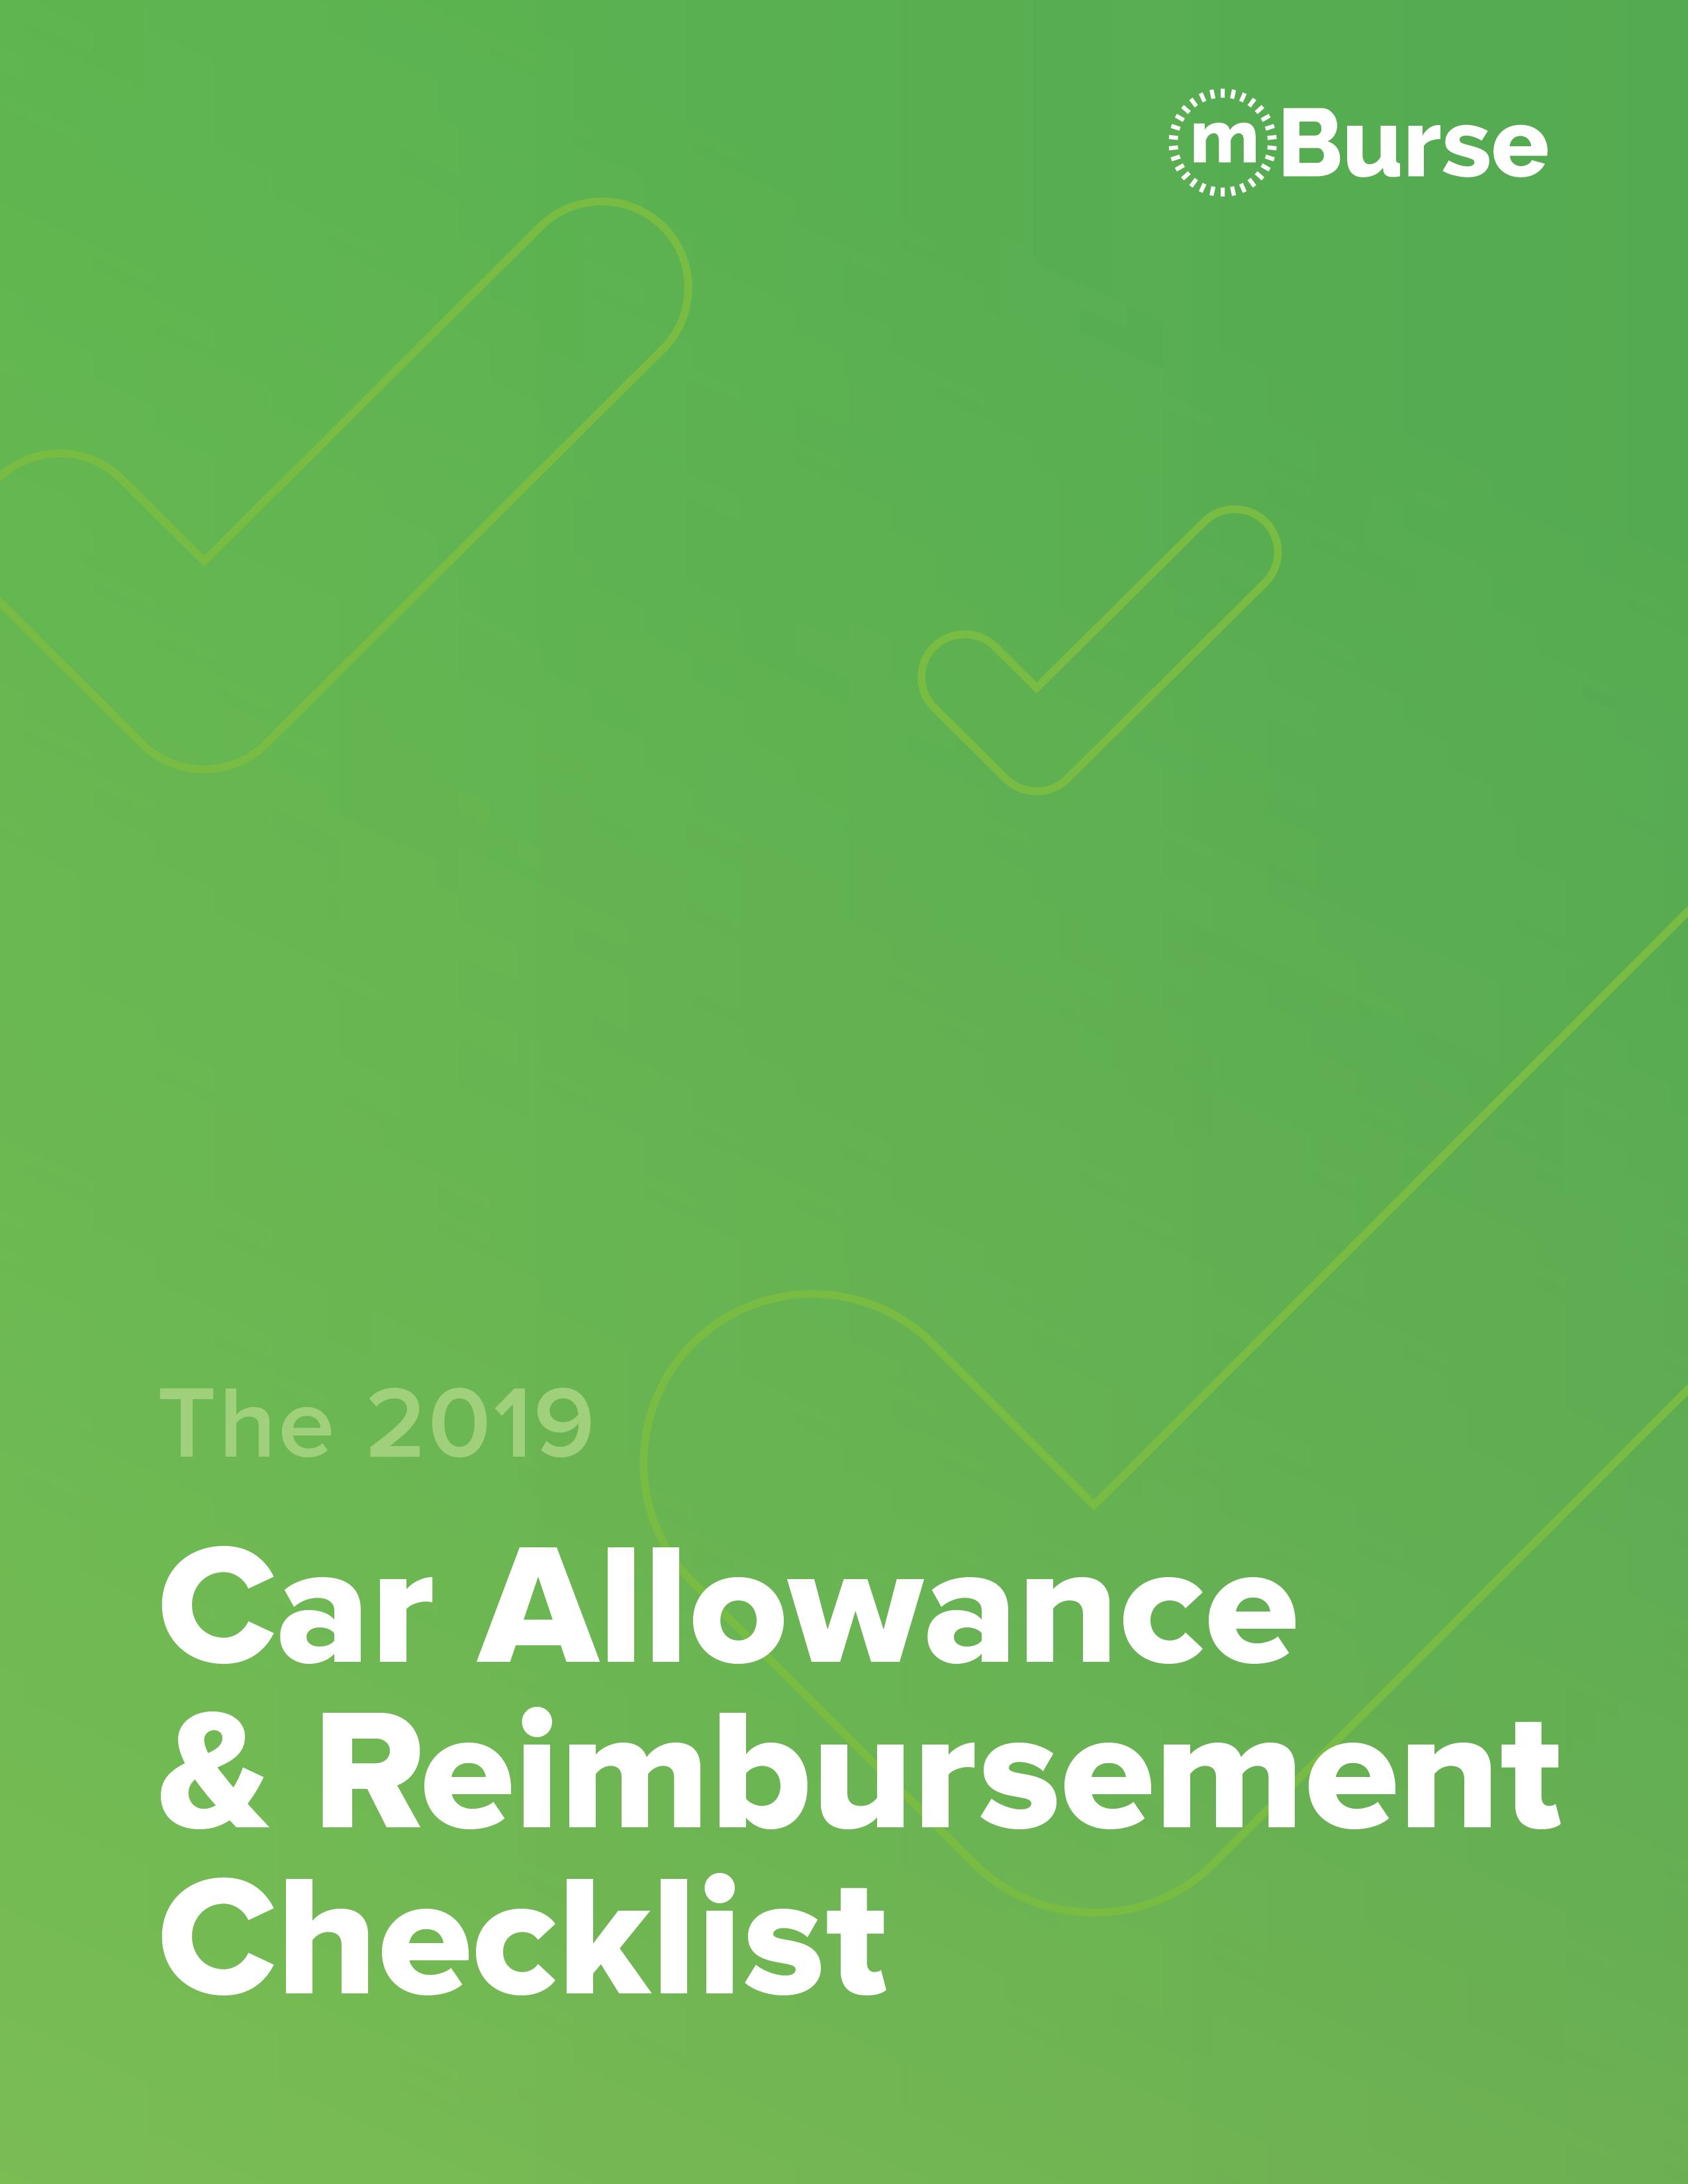 mBurse_checklists_company car allowance